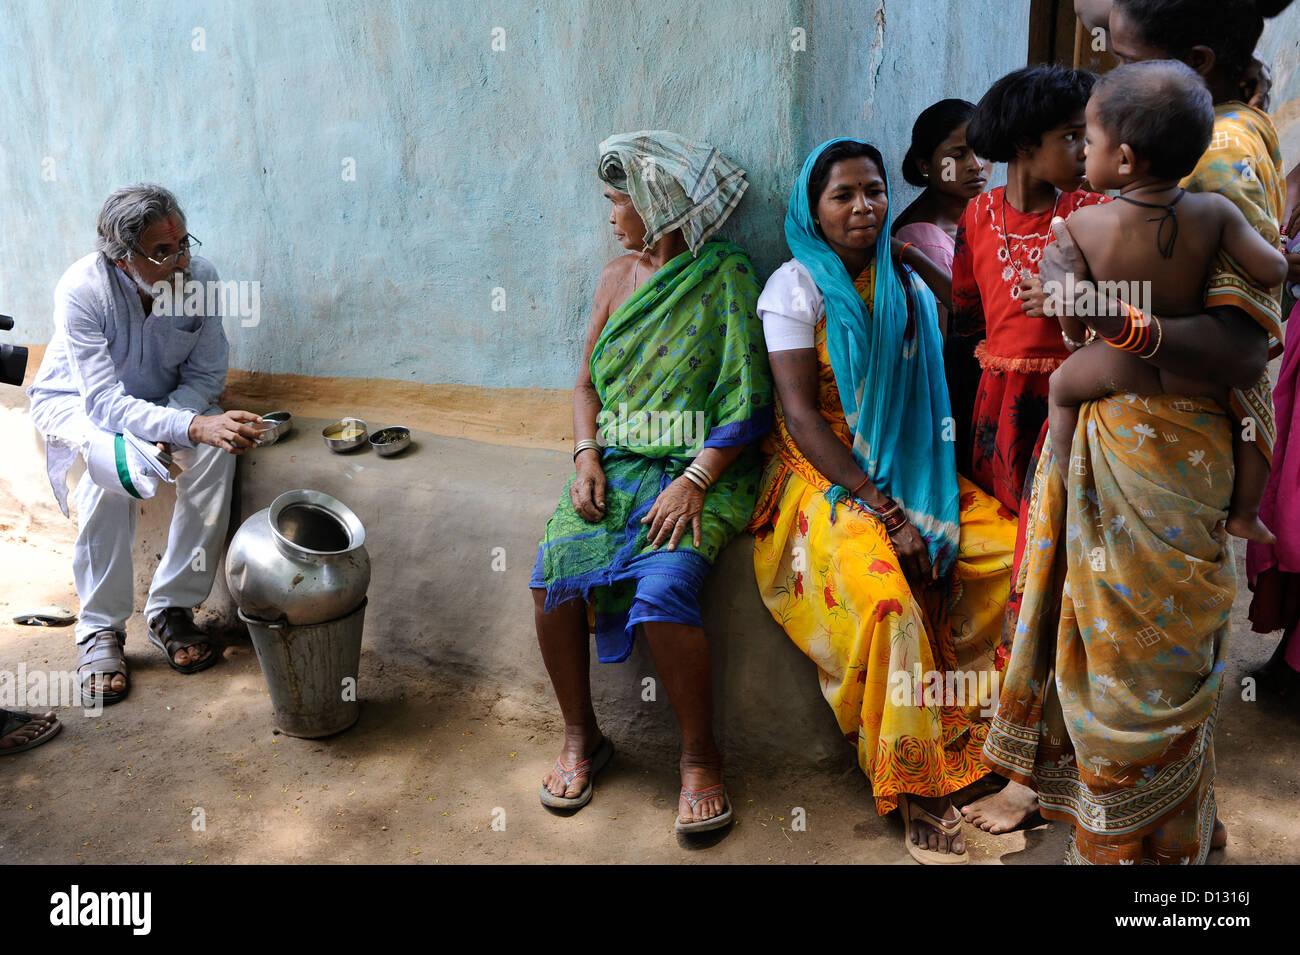 INDIA Chhattisgarh, Prof. Anil Gupta and NGO SRISTI discover on the walking tour Shodh Yatra local knowledge and - Stock Image